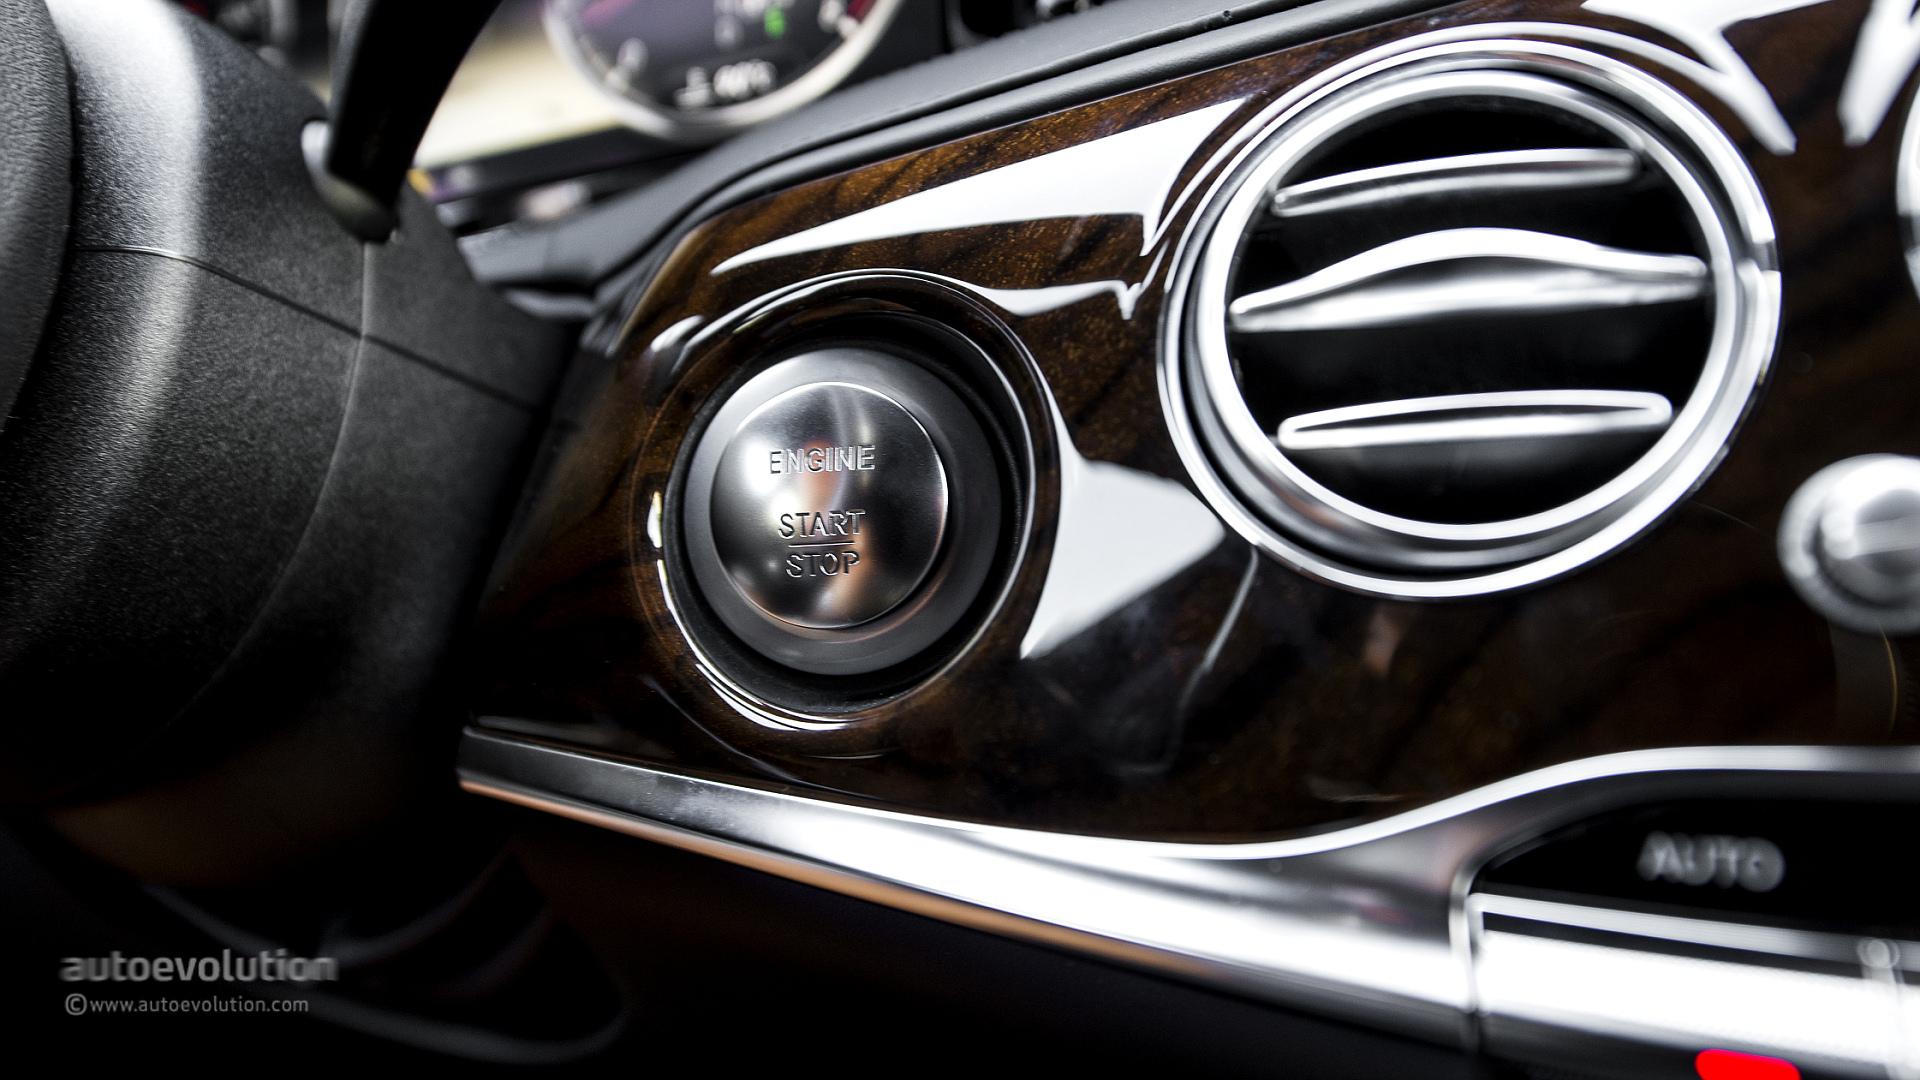 2014 MERCEDES-BENZ S550 engine start button: www.autoevolution.com/testdrive-hd-photo/2014-mercedes-benz-s500...